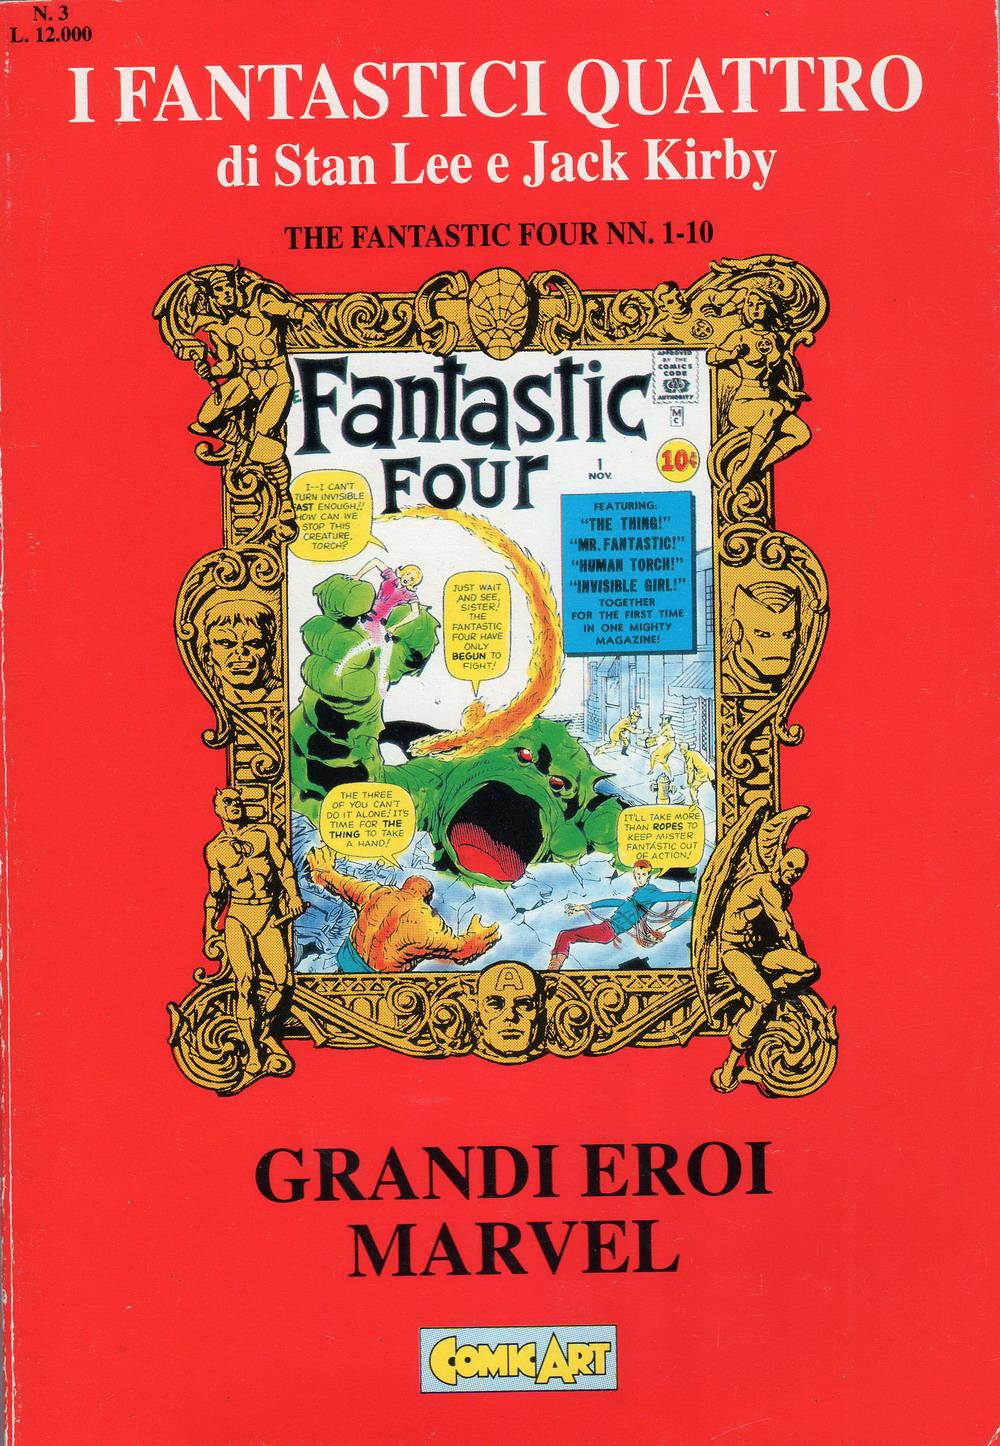 I Fantastici Quattro vol. 1